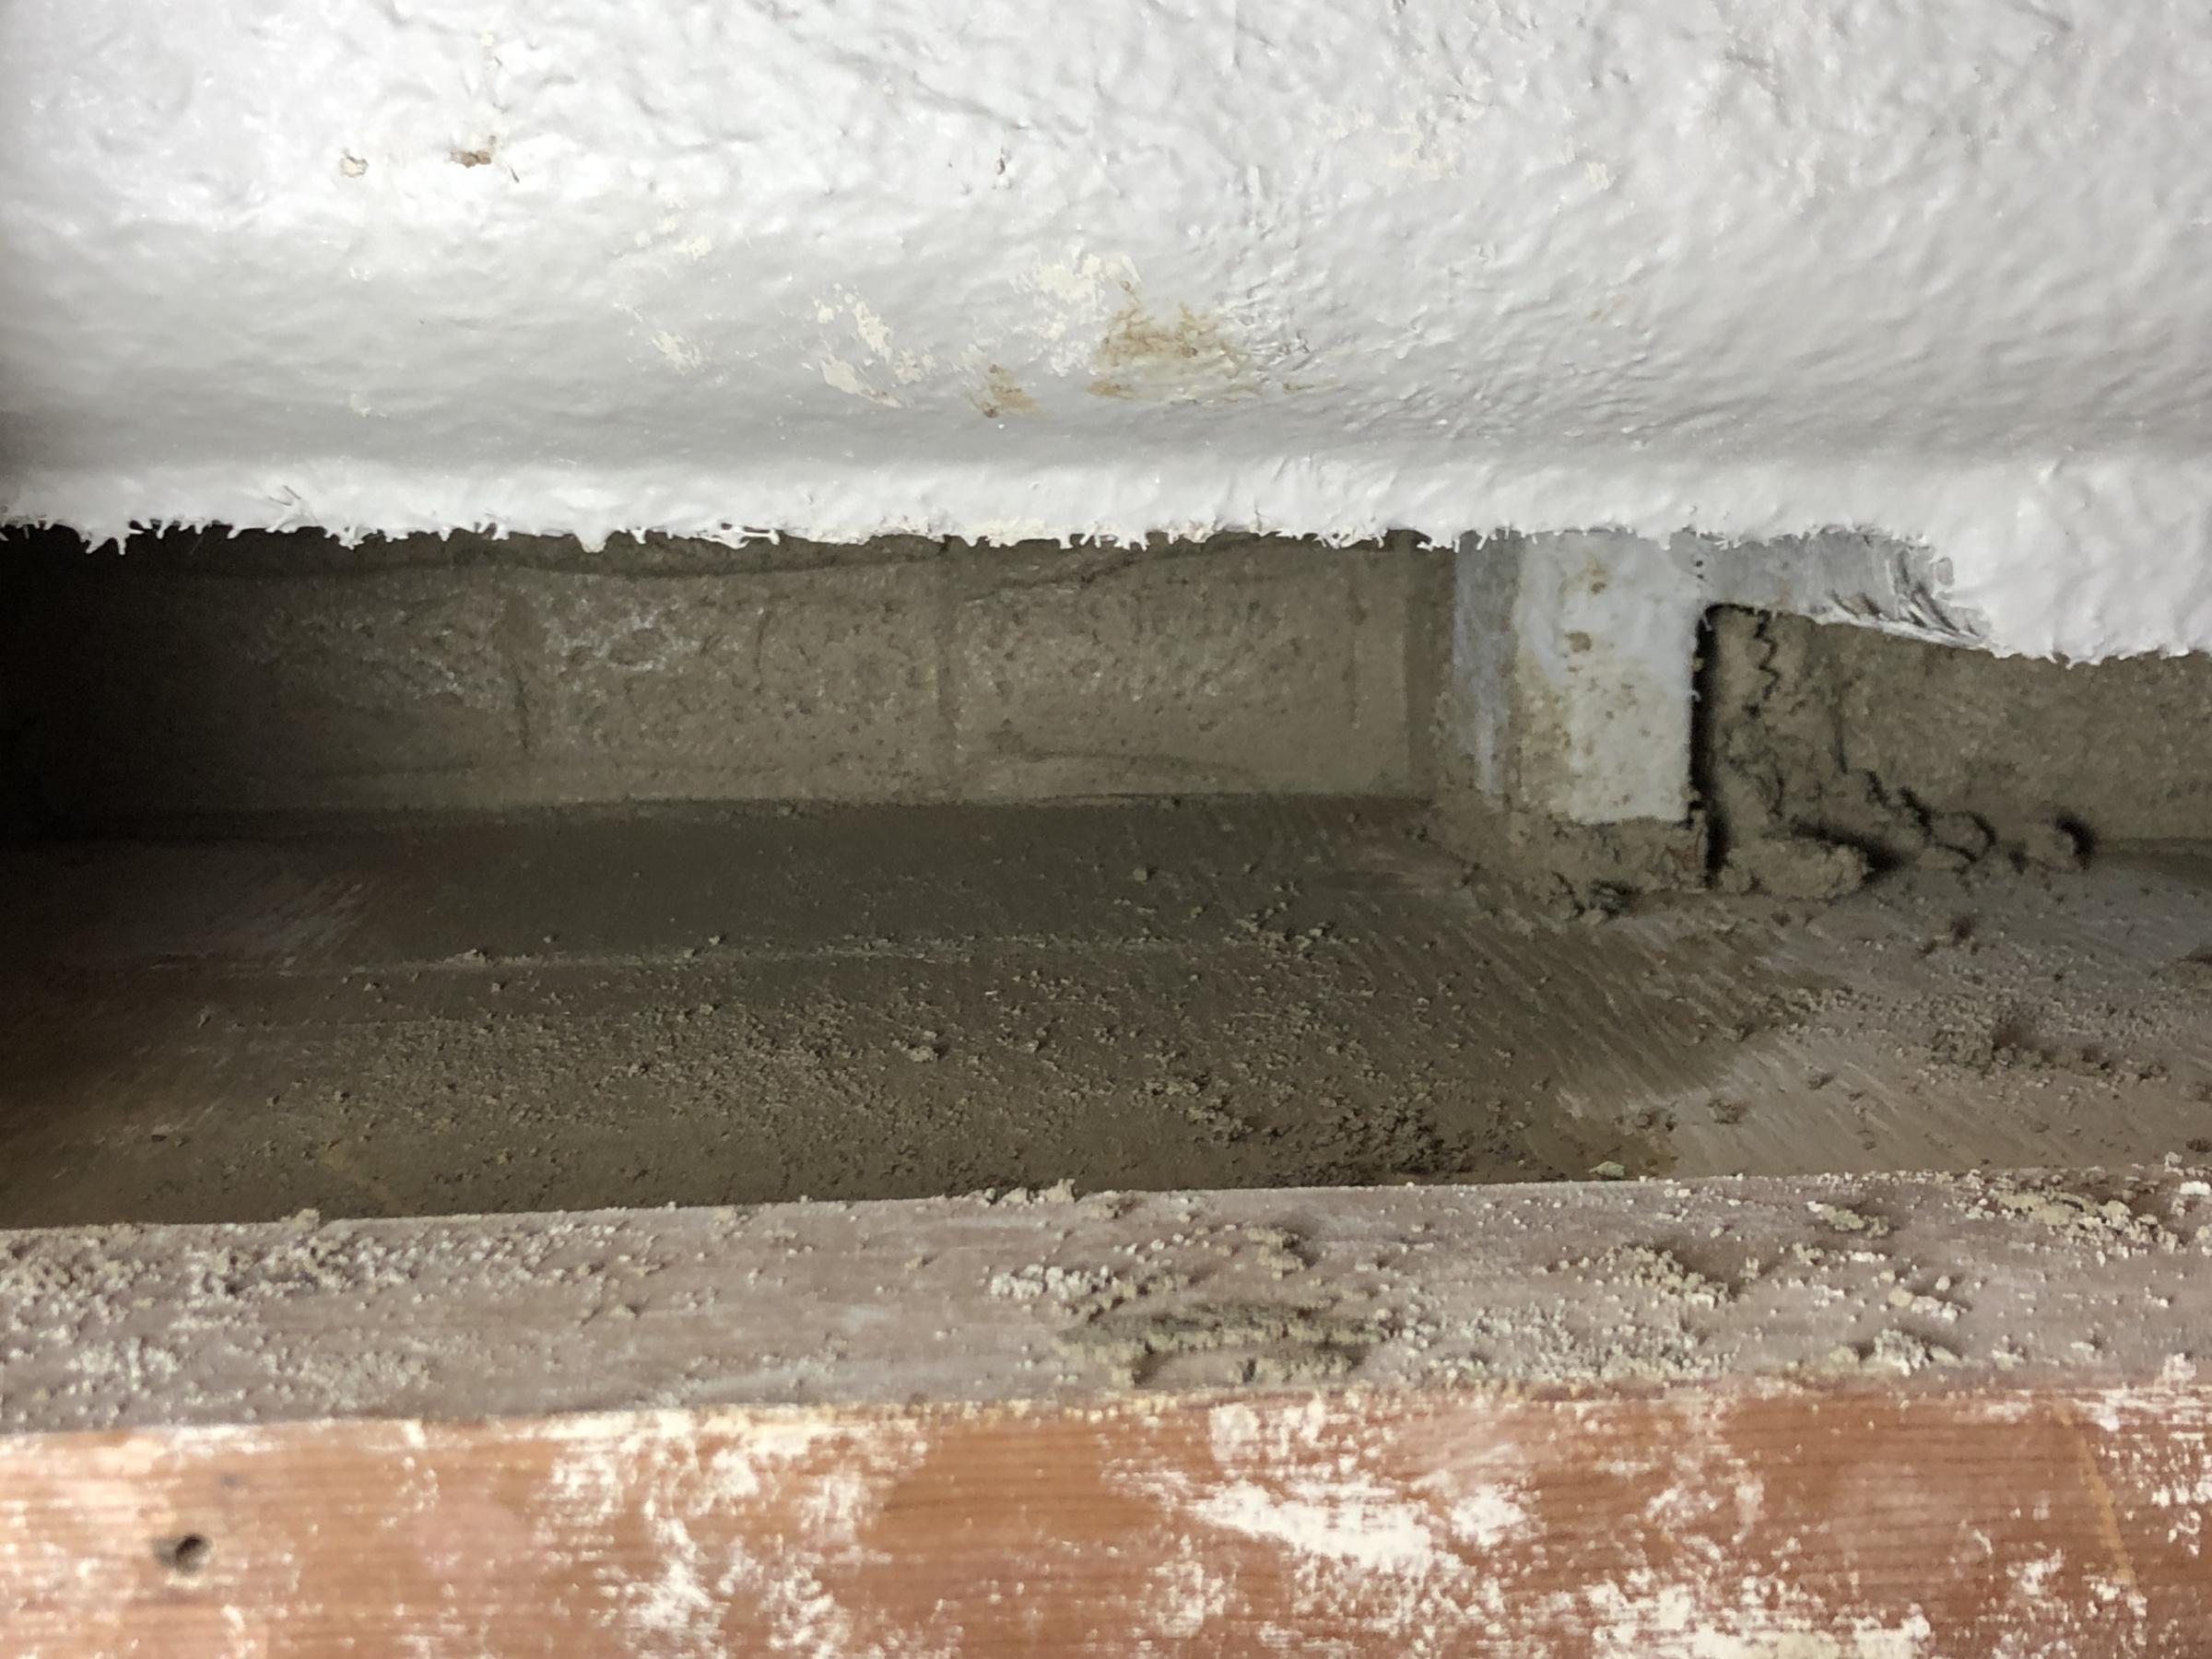 Bath tub bedding: mortar or foam or...? (after tub in place/installed)-img_4062.jpg